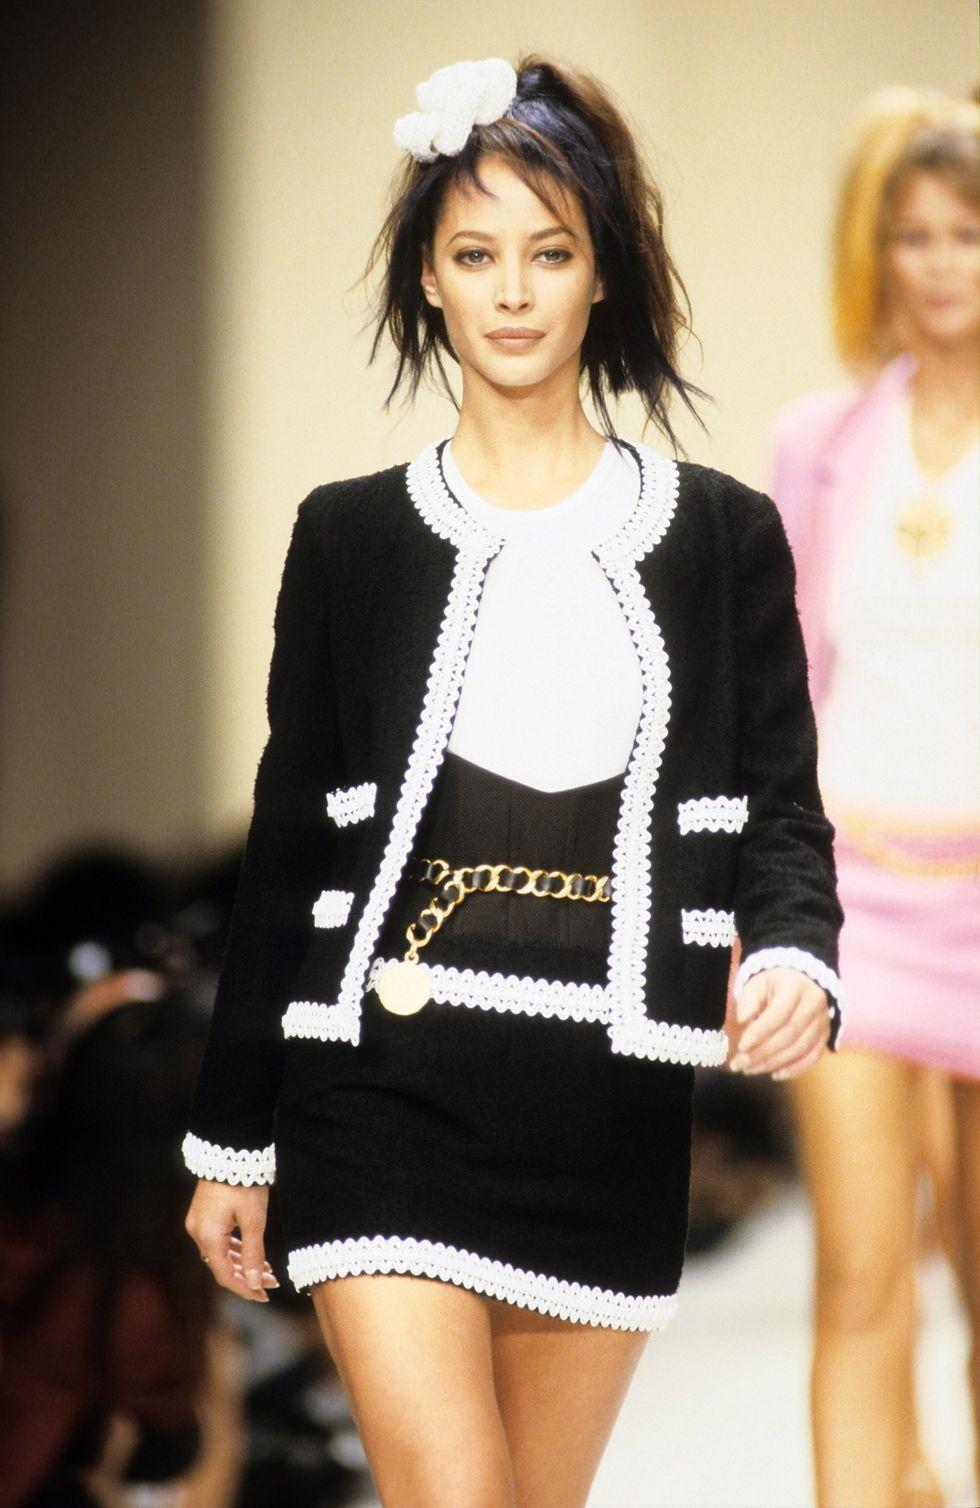 Chanel Lente/Zomer 1994 show Karl Lagerfeld